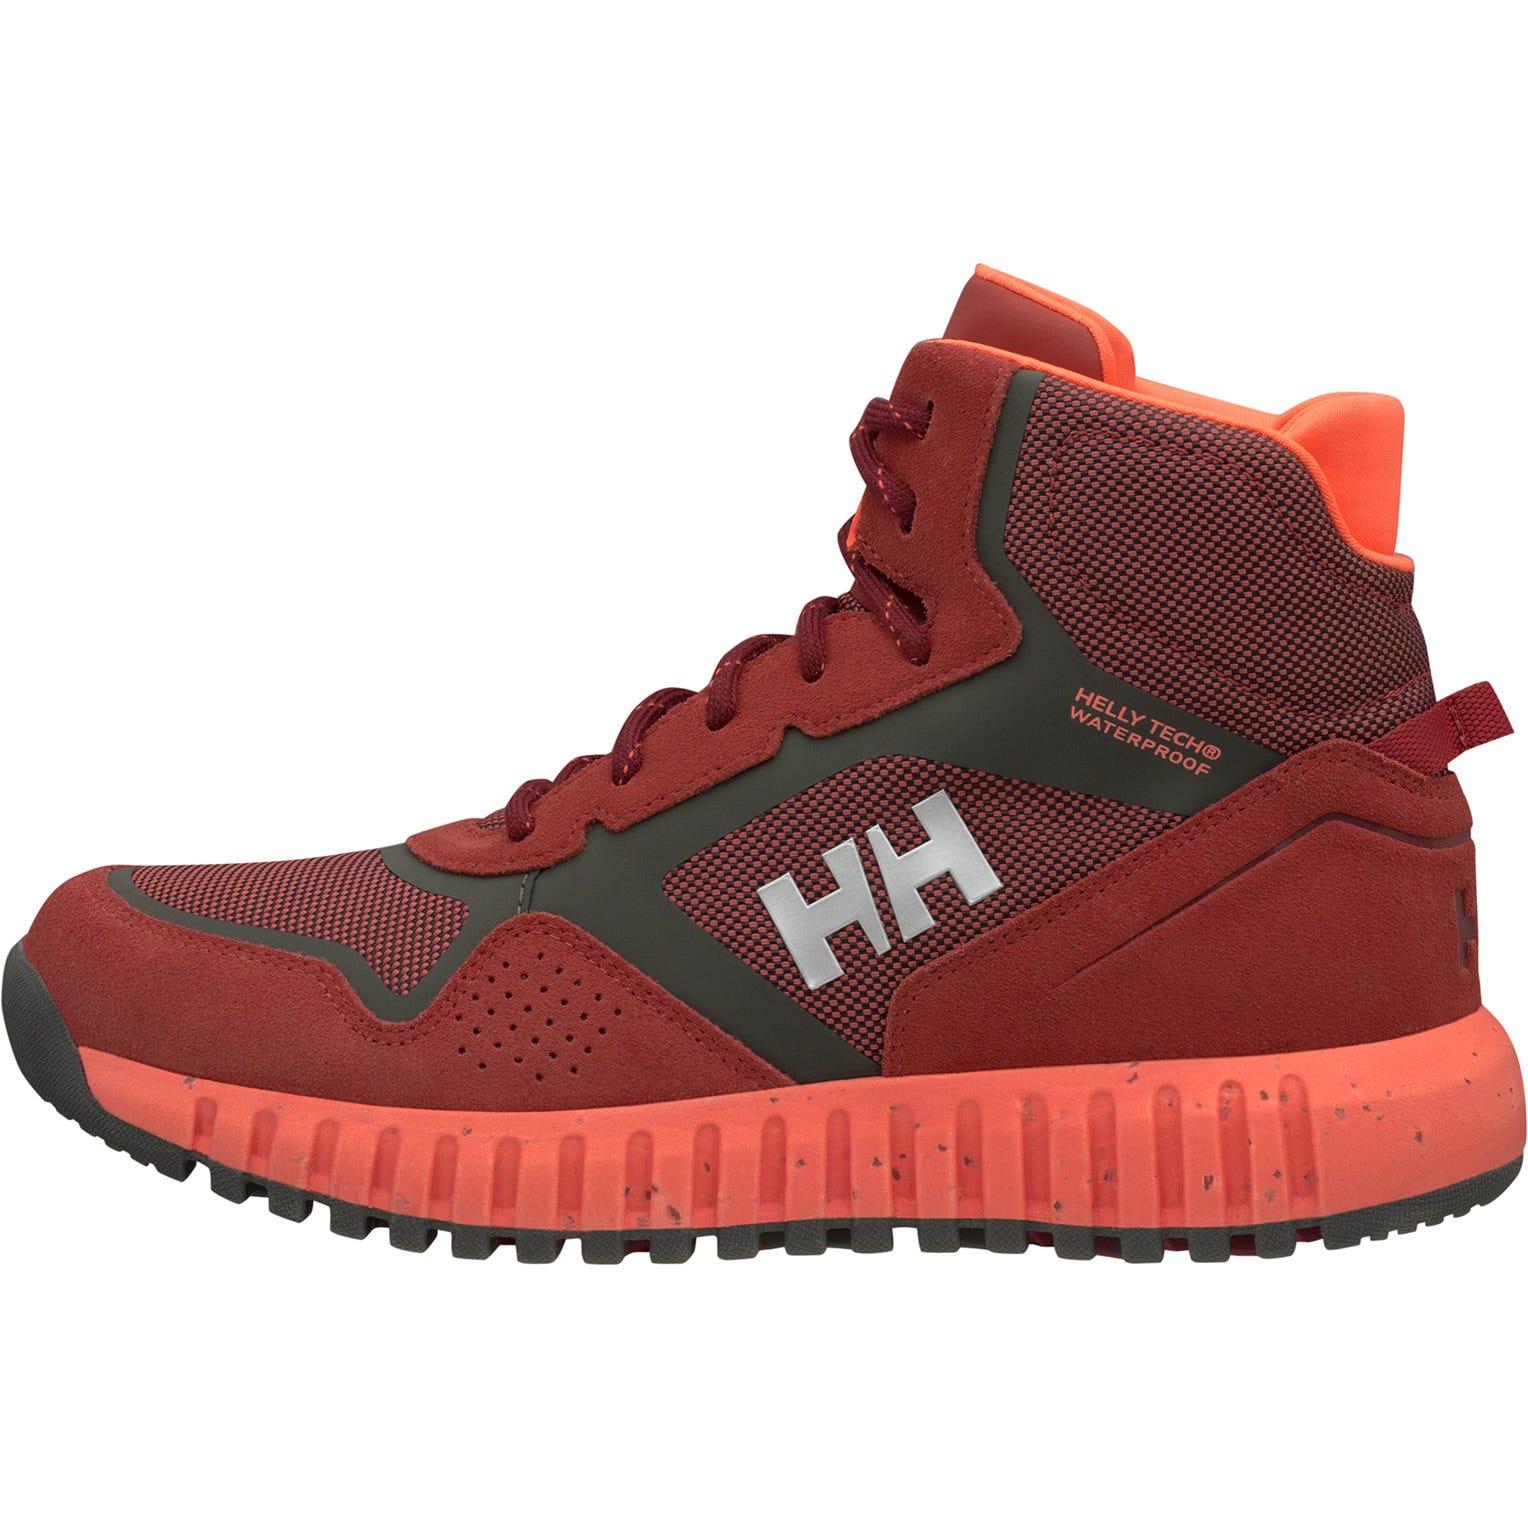 Helly Hansen W Monashee Ullr Ht Womens Hiking Boot Red 41/9.5